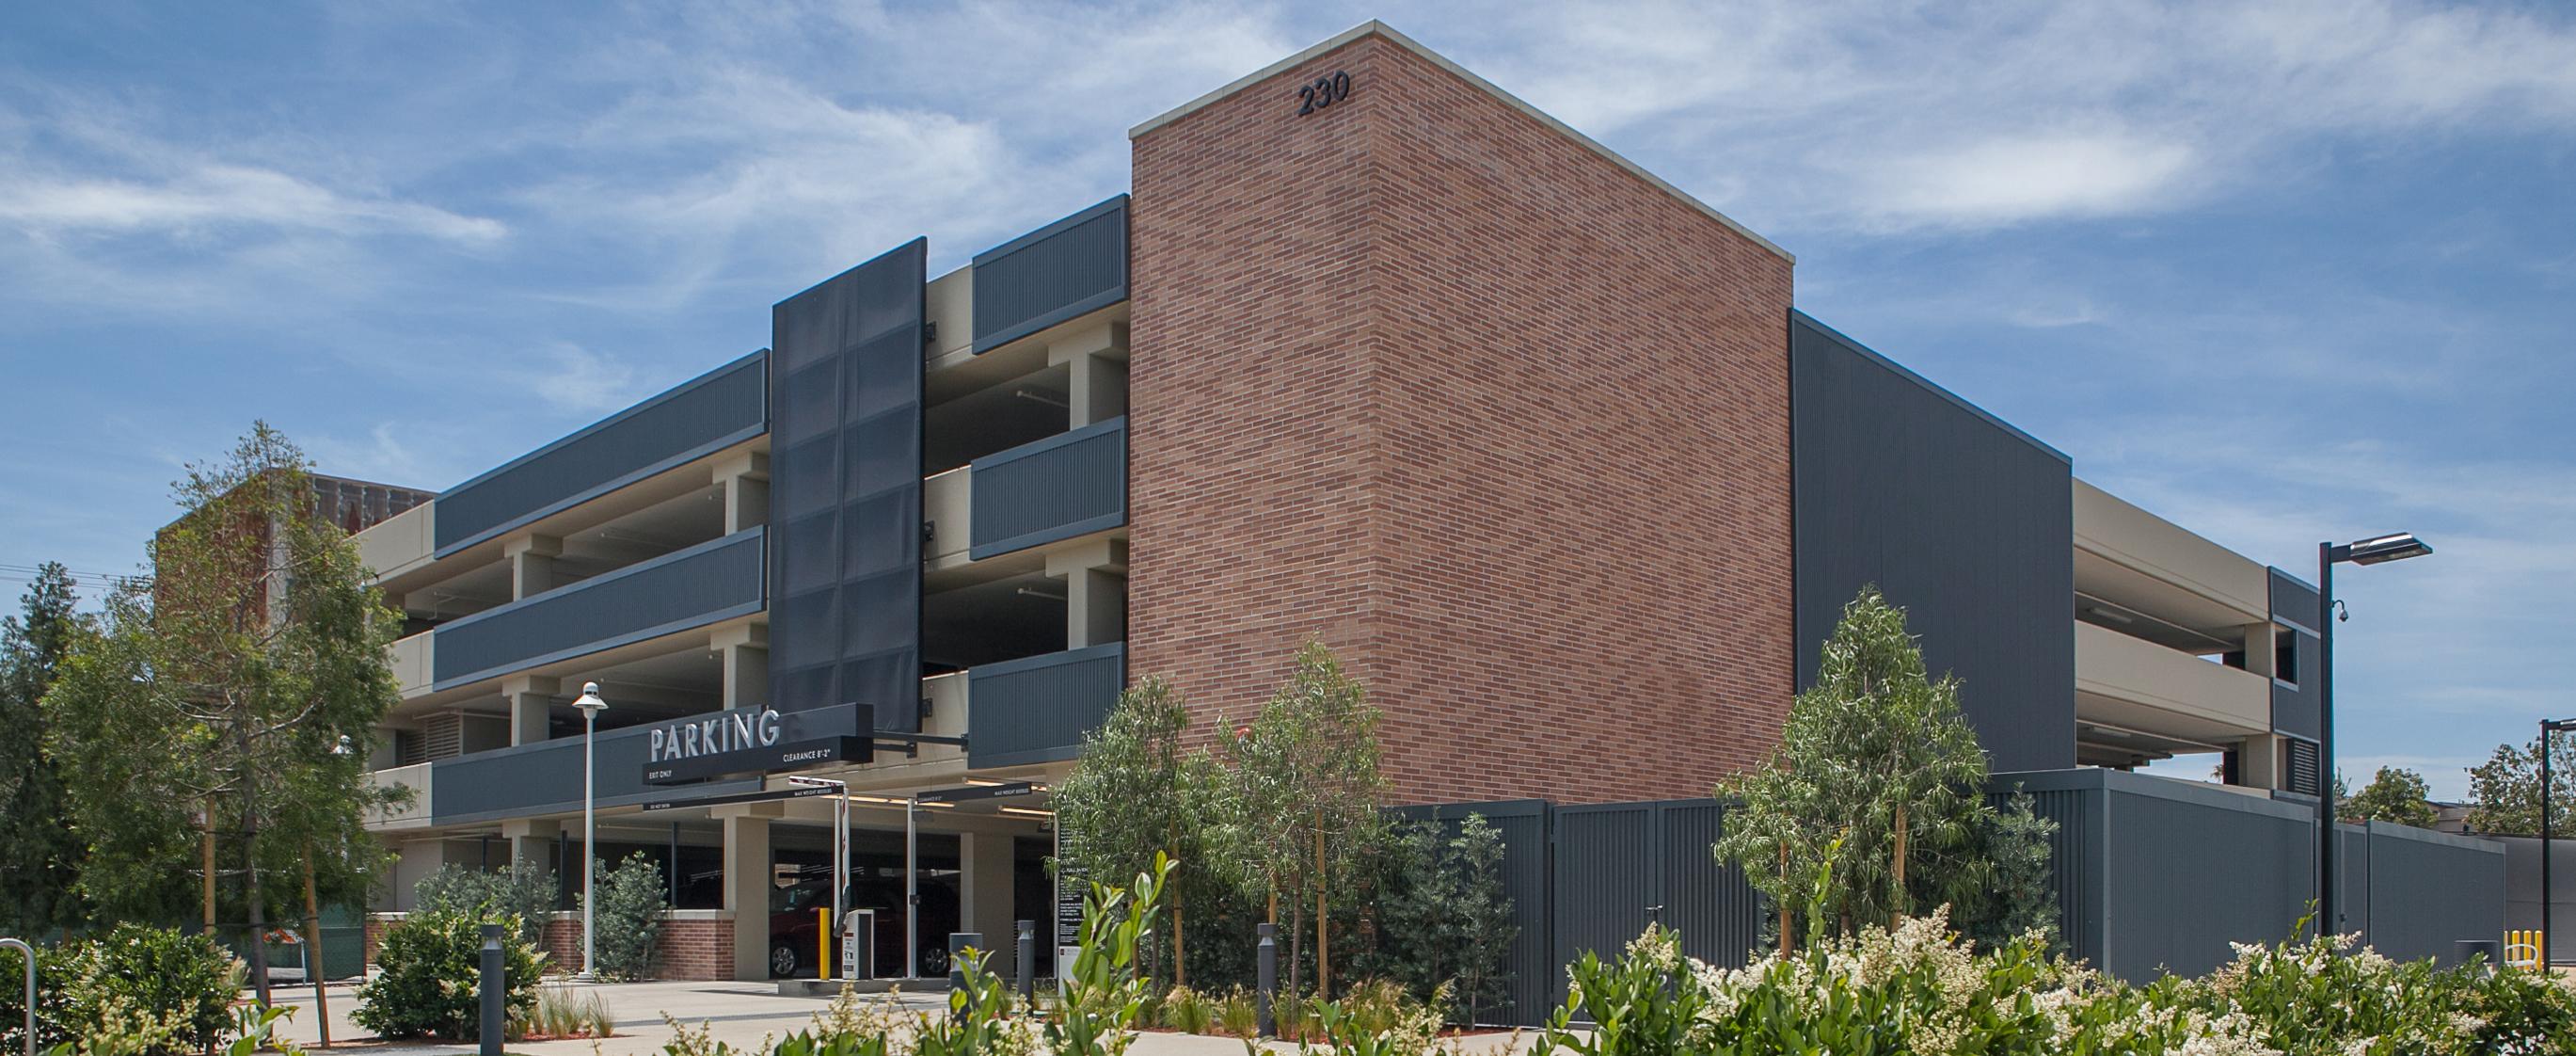 Chapman University - Filmmaker's Parking Structure